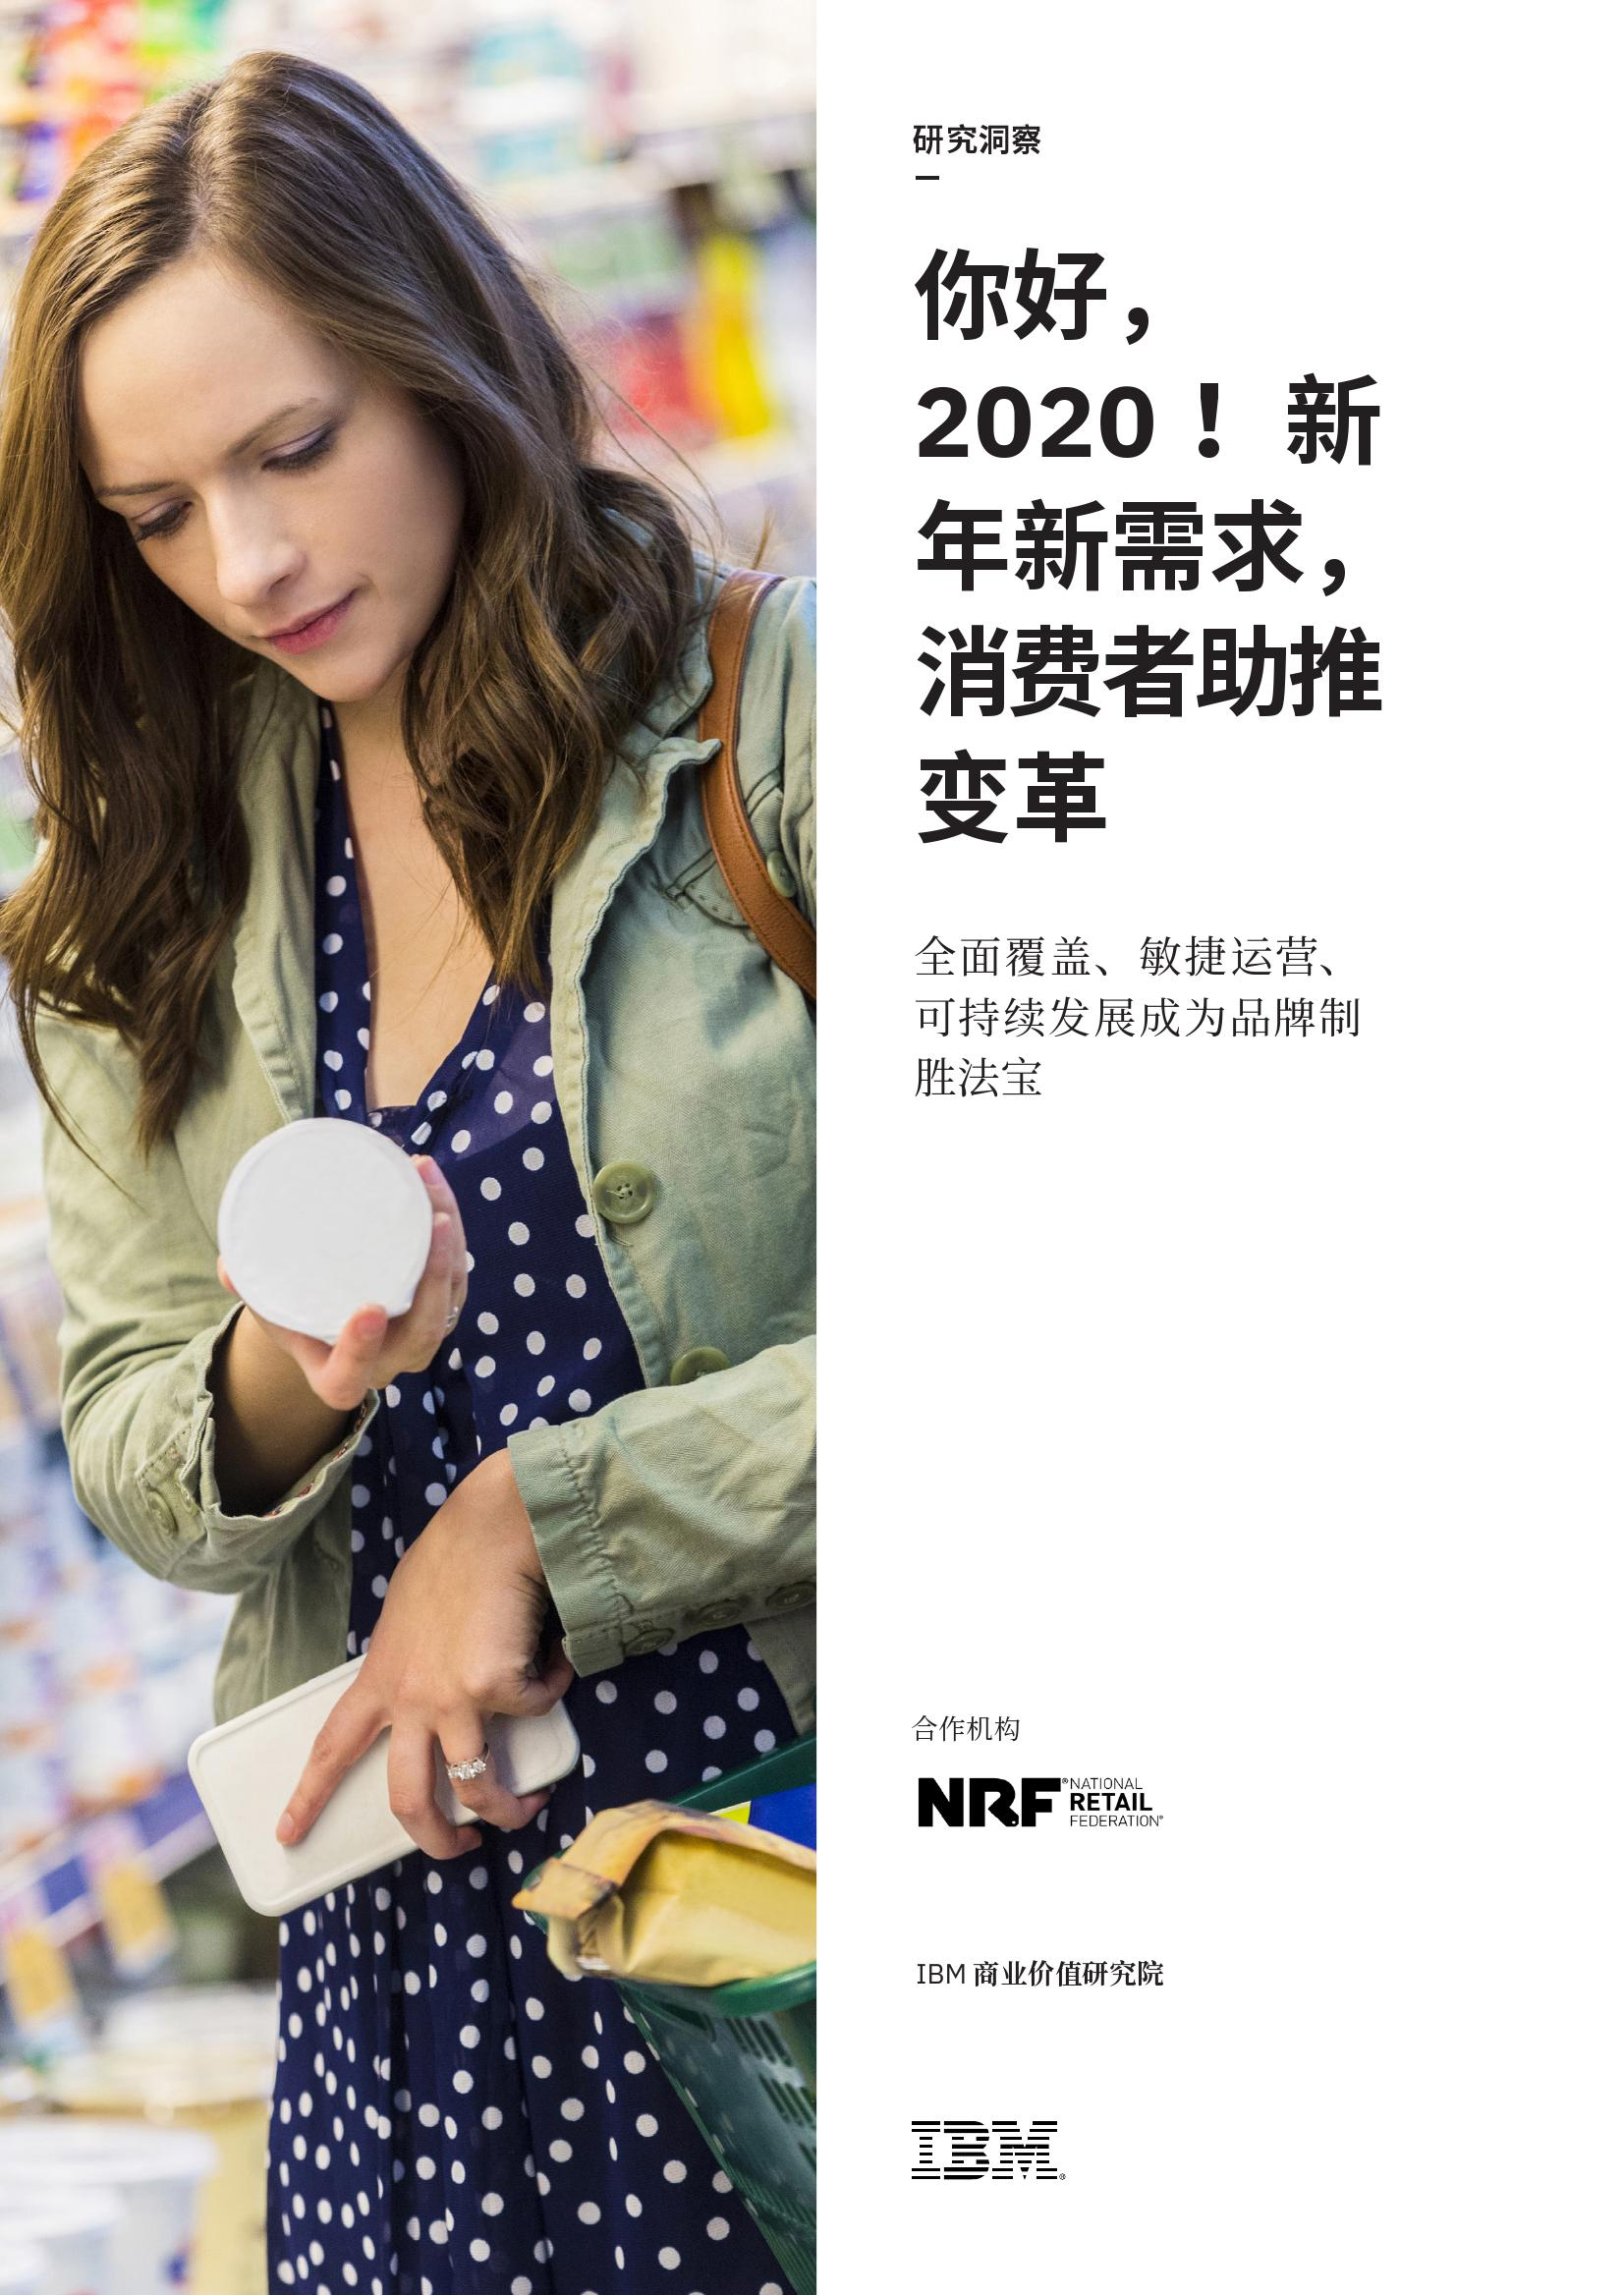 IBM:2020!新年新需求,消费者助推变革(附下载)